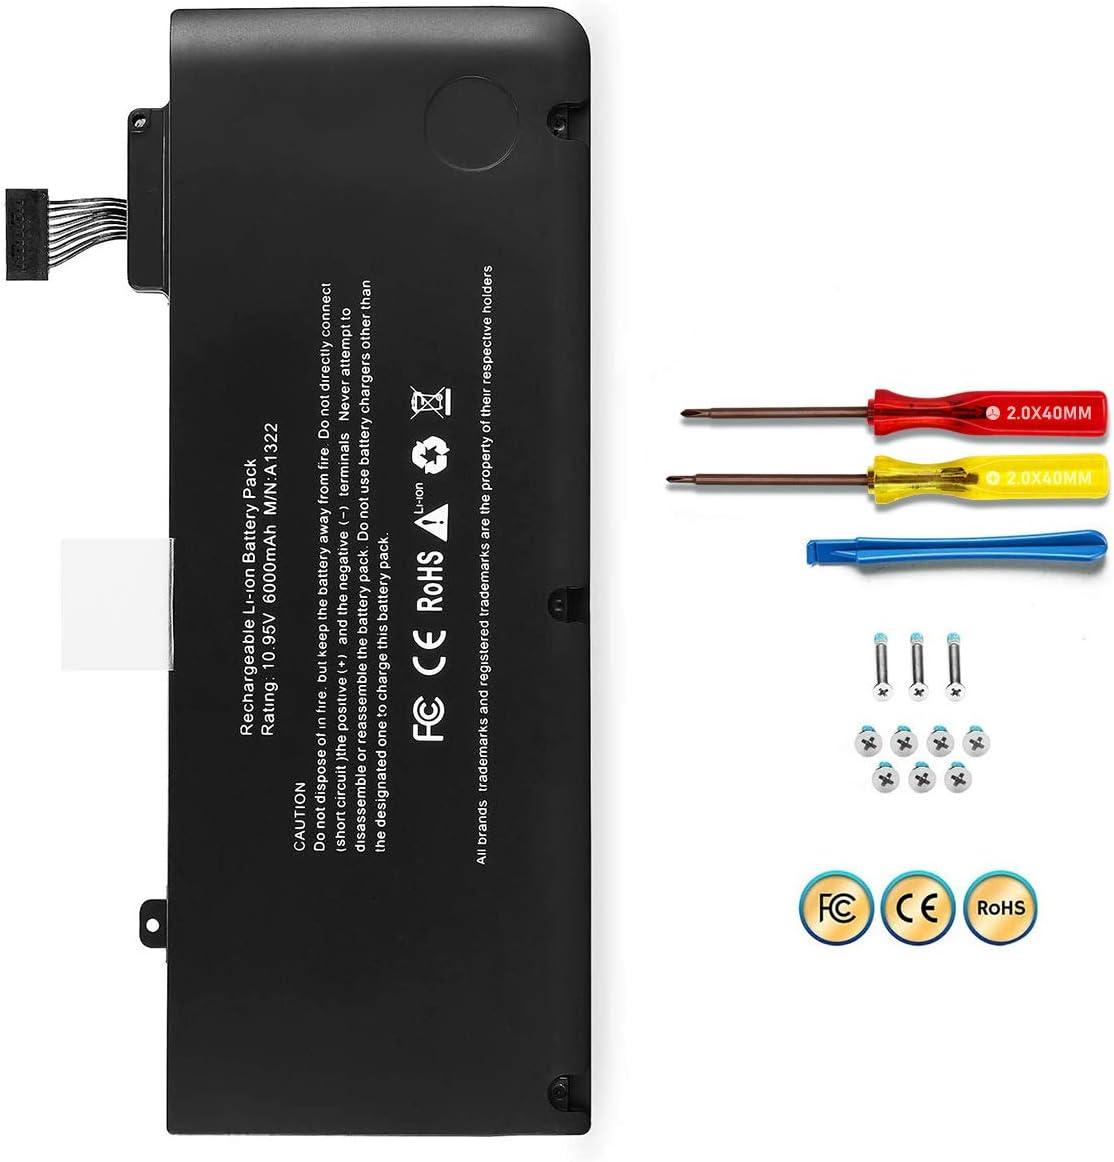 POWERWOO A1322 A1278 Battery for Apple MacBook pro 13 '' 2009 2010 2011 2012 with 6000mAh Newer Tech (MC374LL/A MB990LL/A MB991LL/A MC700LL/A MD313LL/A MD101LL/A MD102LL/A Battery)[ 10.95V /65.7Wh]